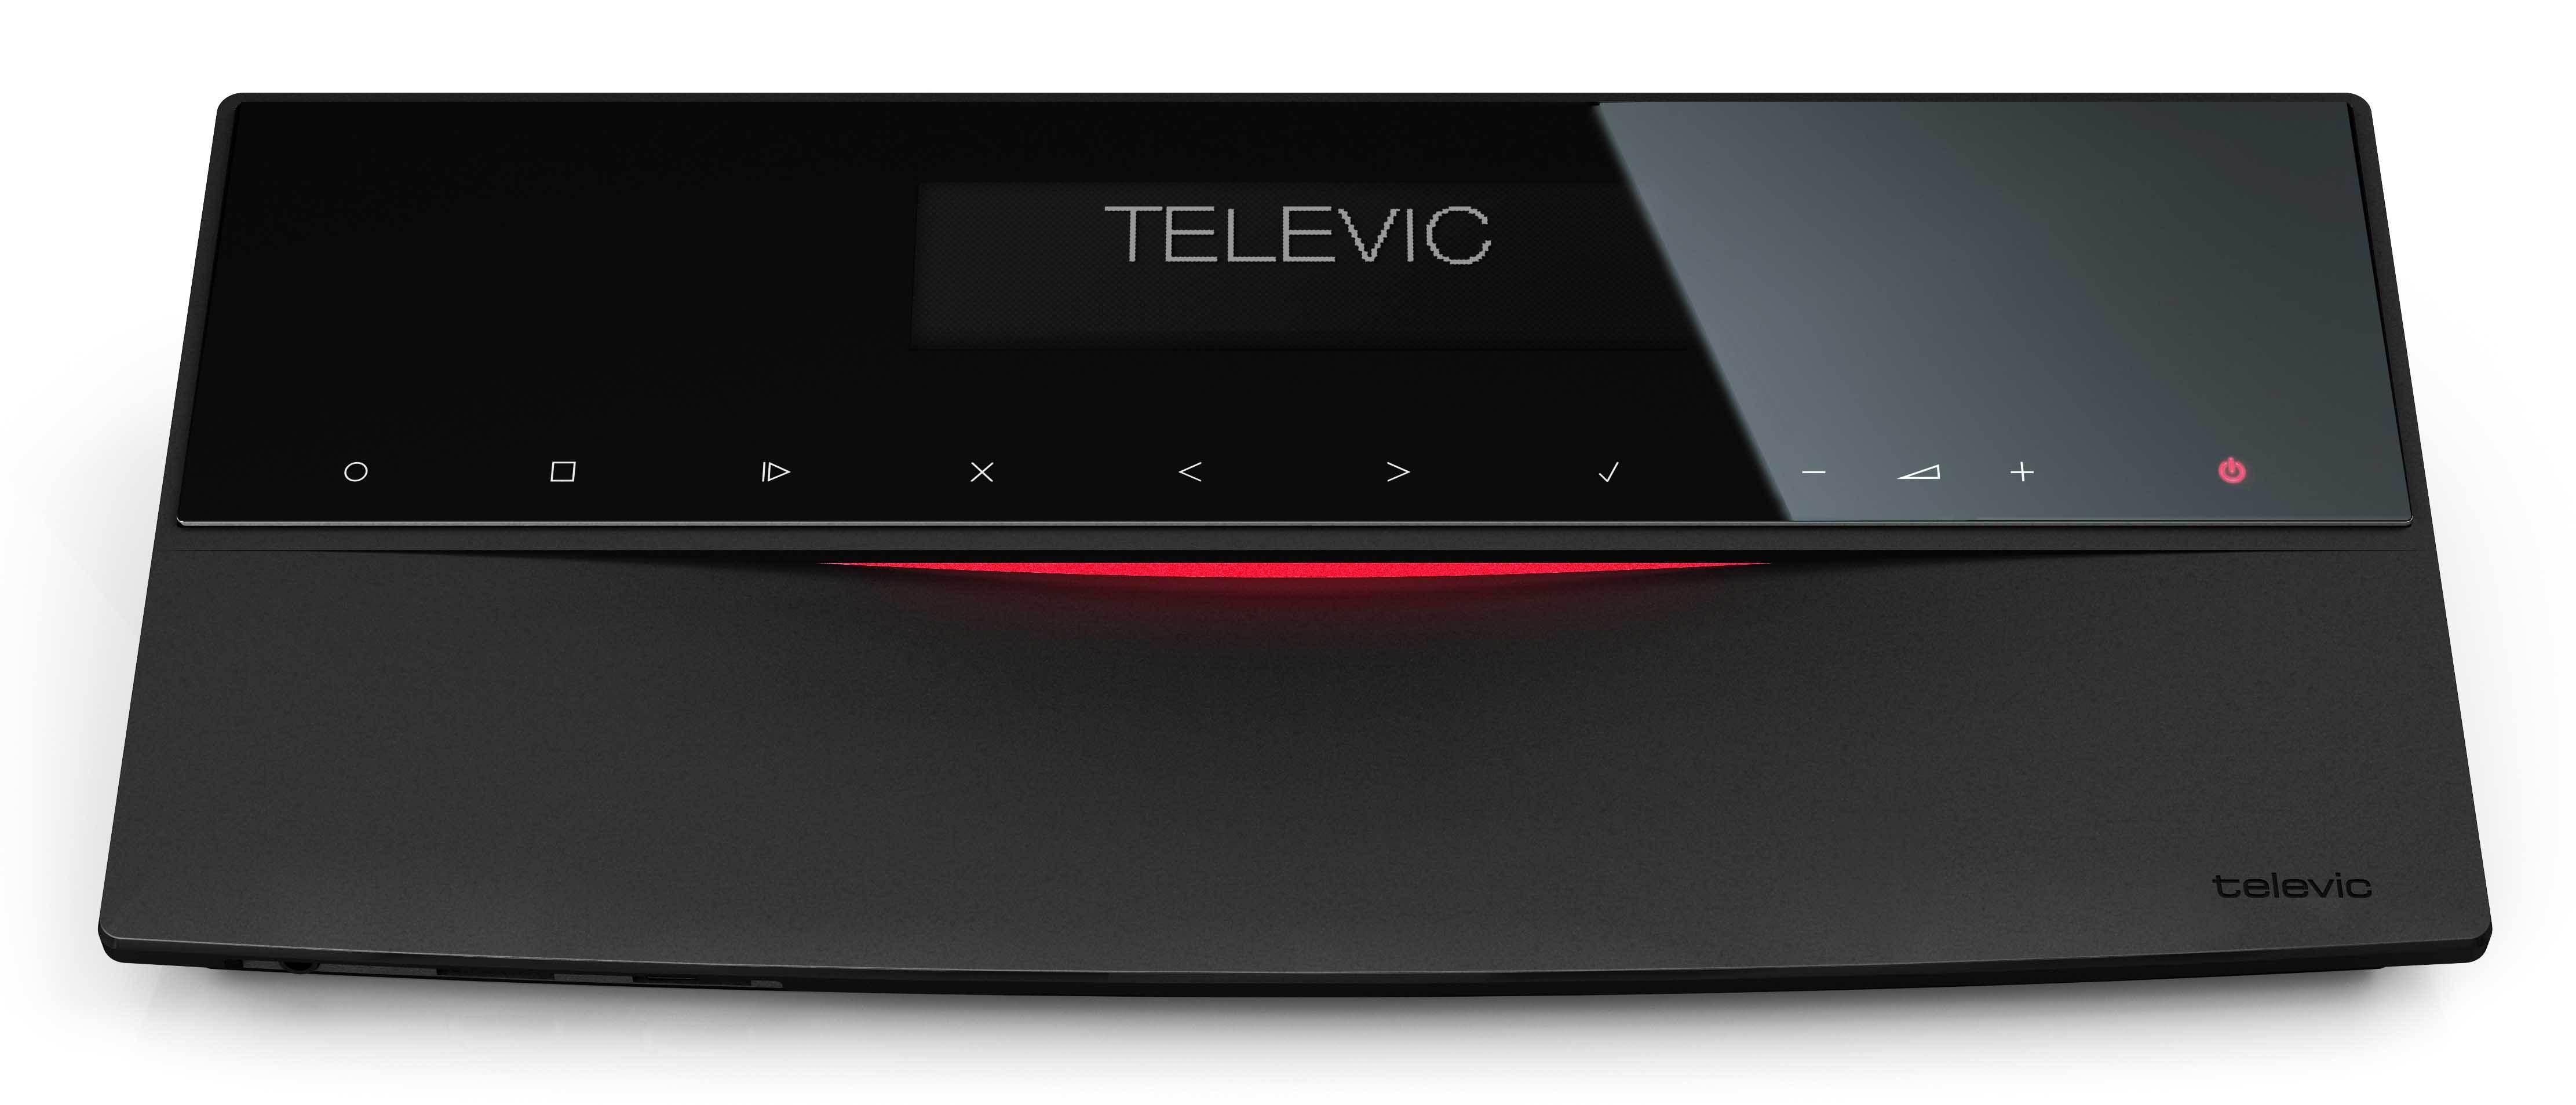 Televic D-Cerno - نمای مقابل سیستم کنفرانس دیجیتال لمسی تلویک با قابلیت اتو ترکینگ